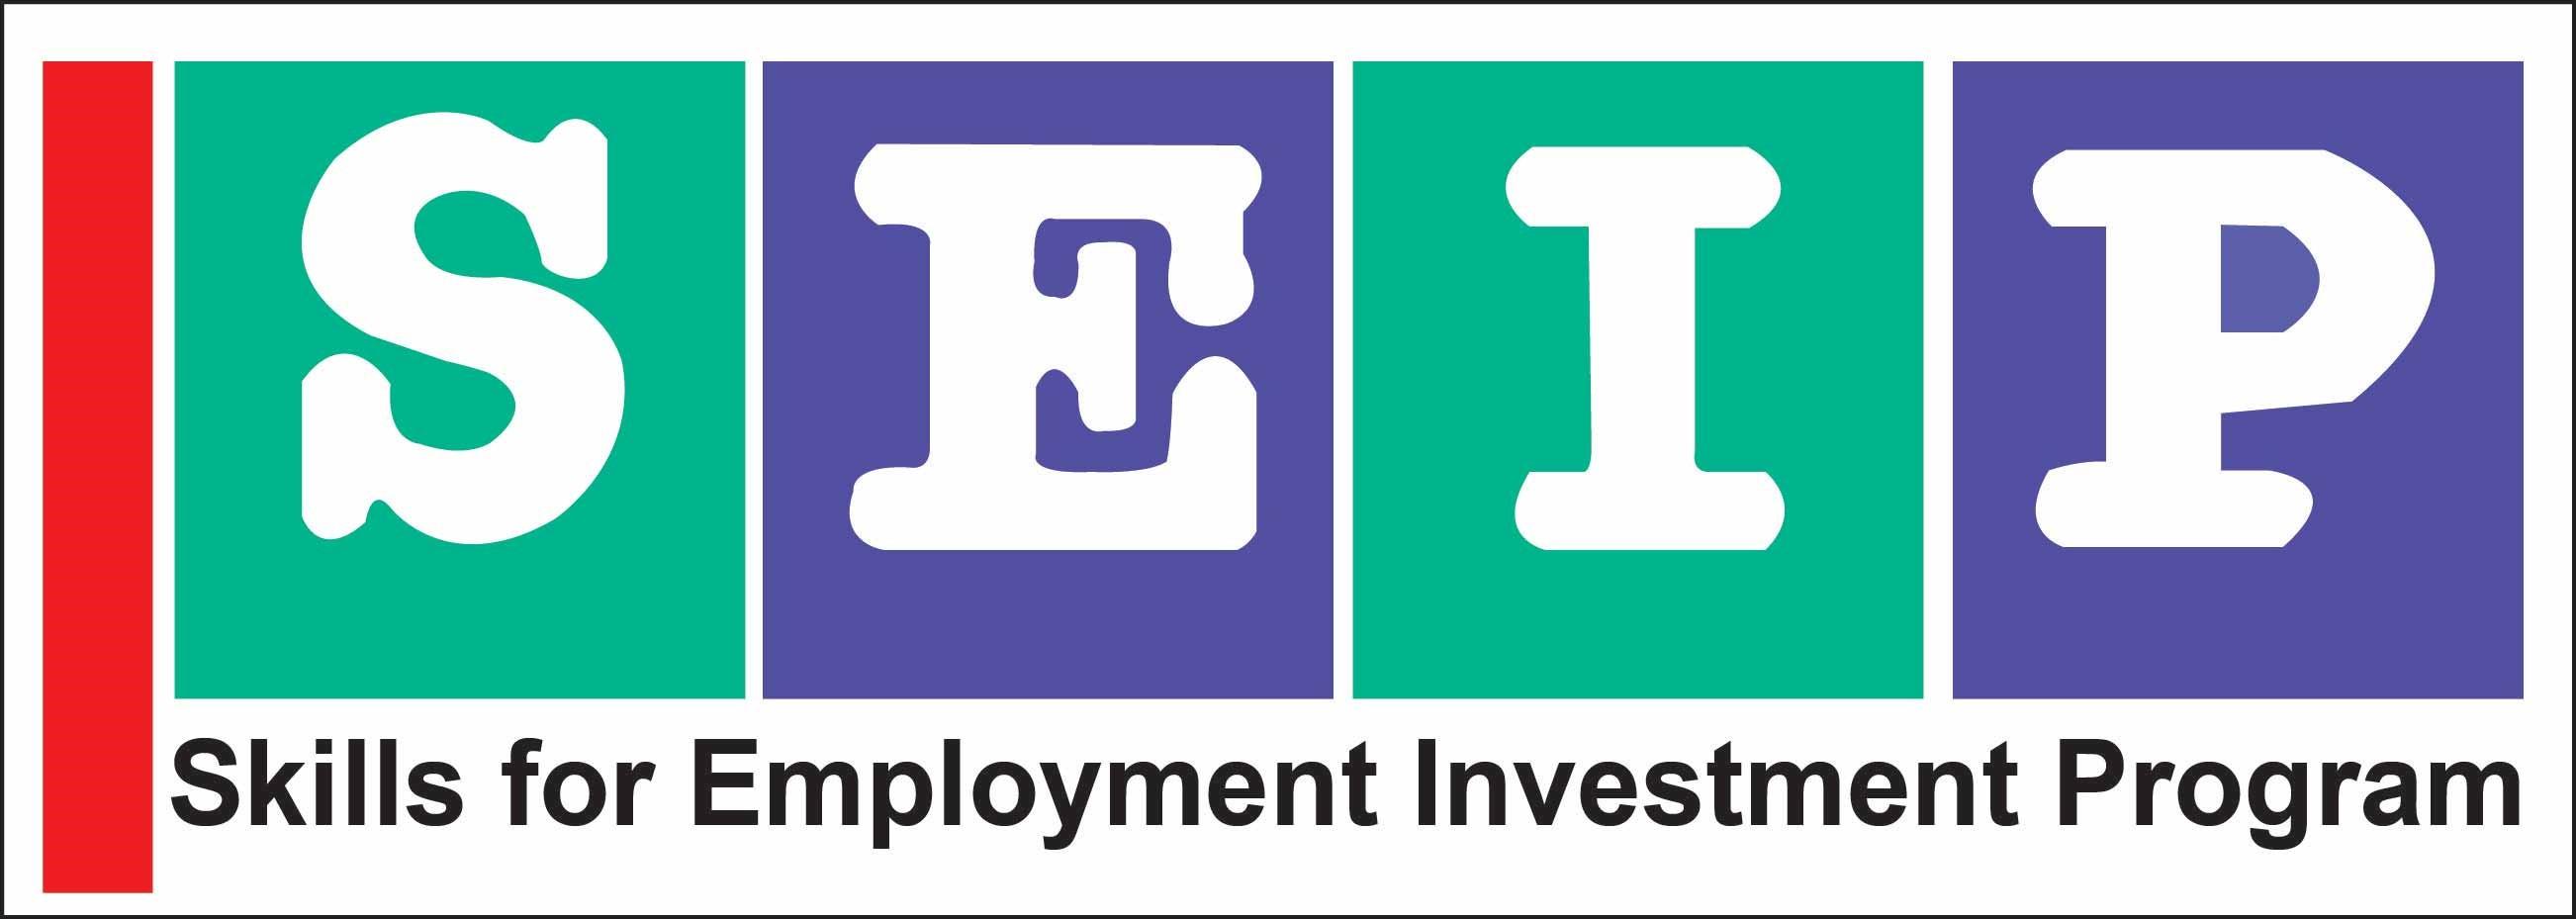 Skills for Employment Investment Program (SEIP)   LinkedIn